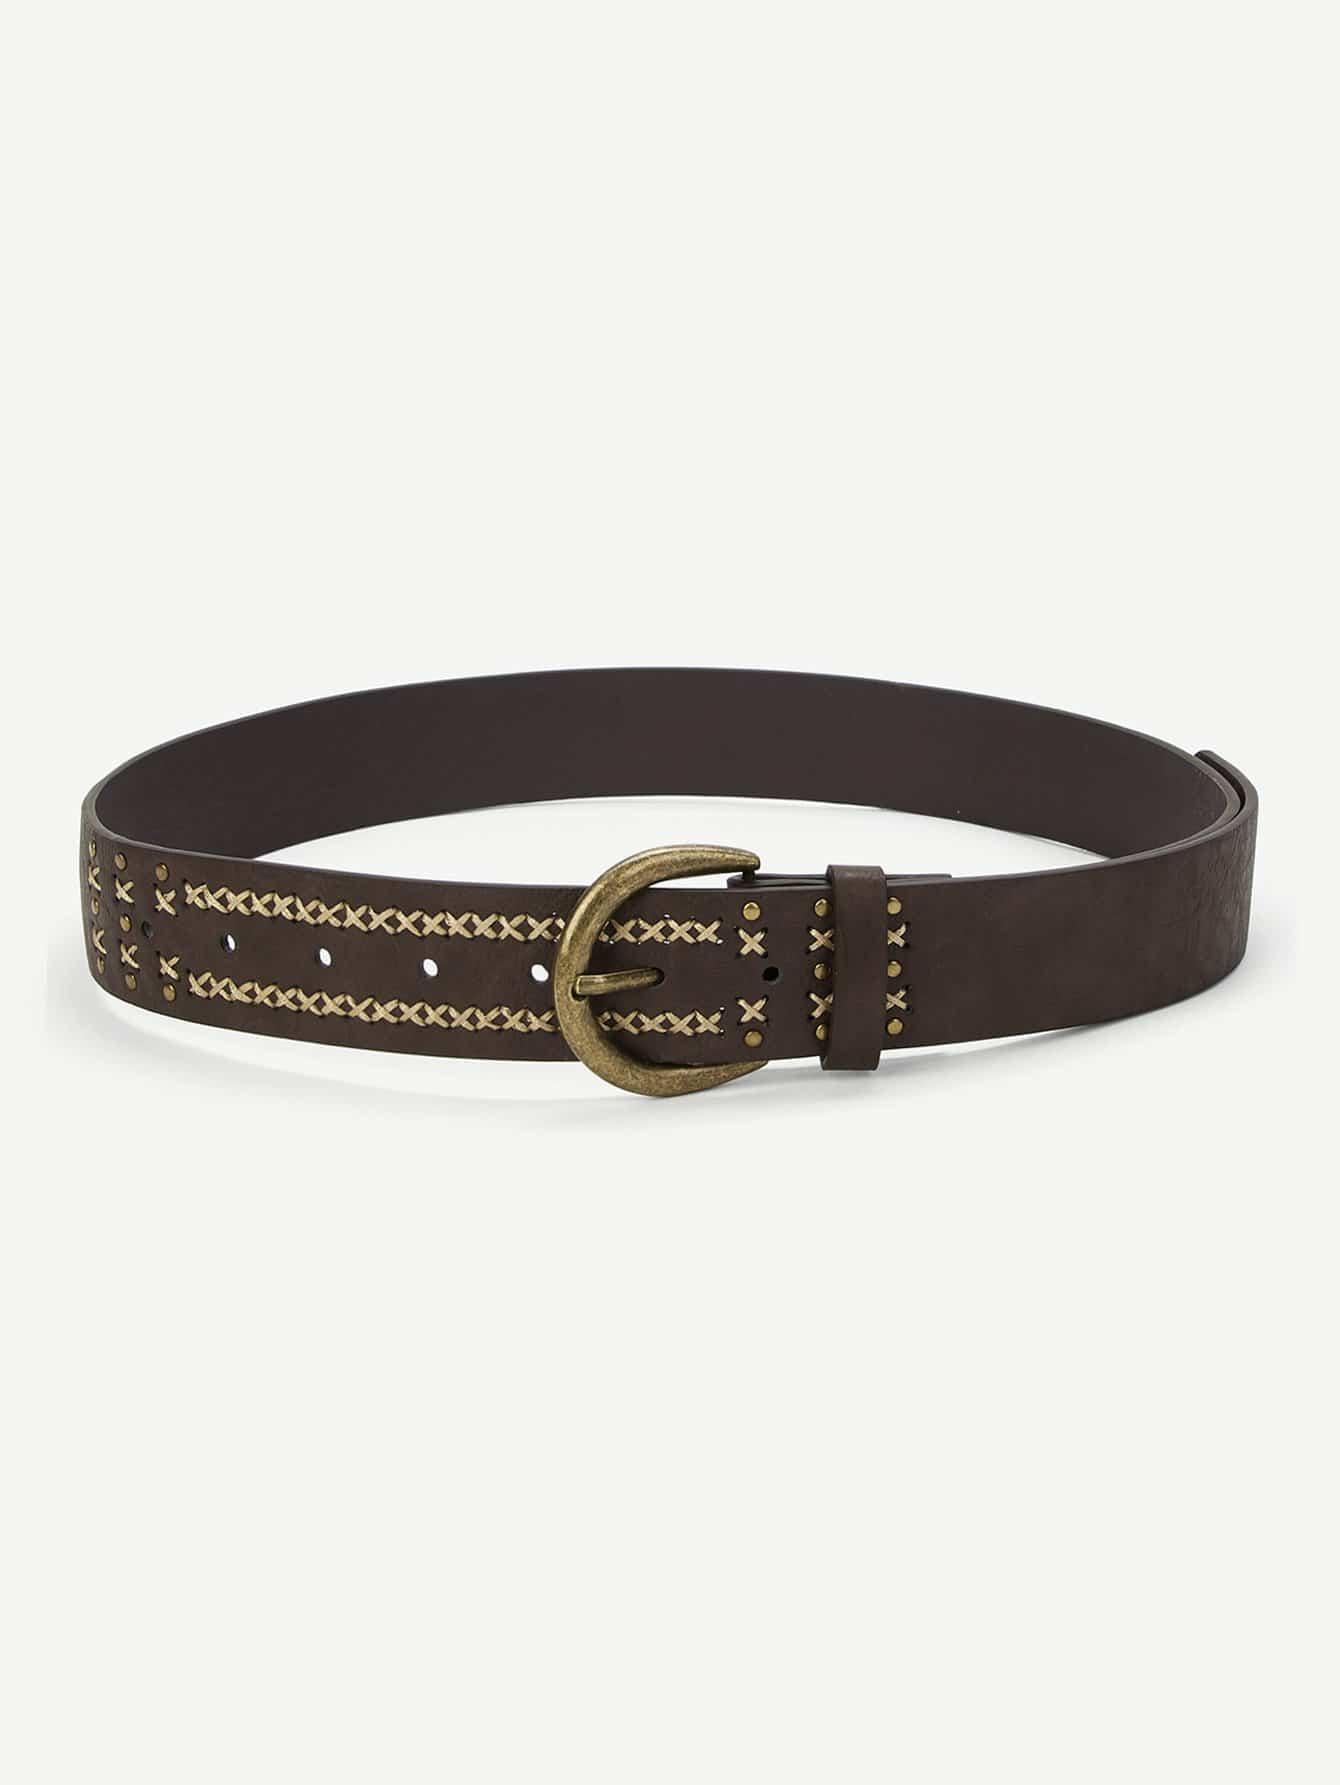 Criss Cross Metal Buckle Belt belt cp v2 metal